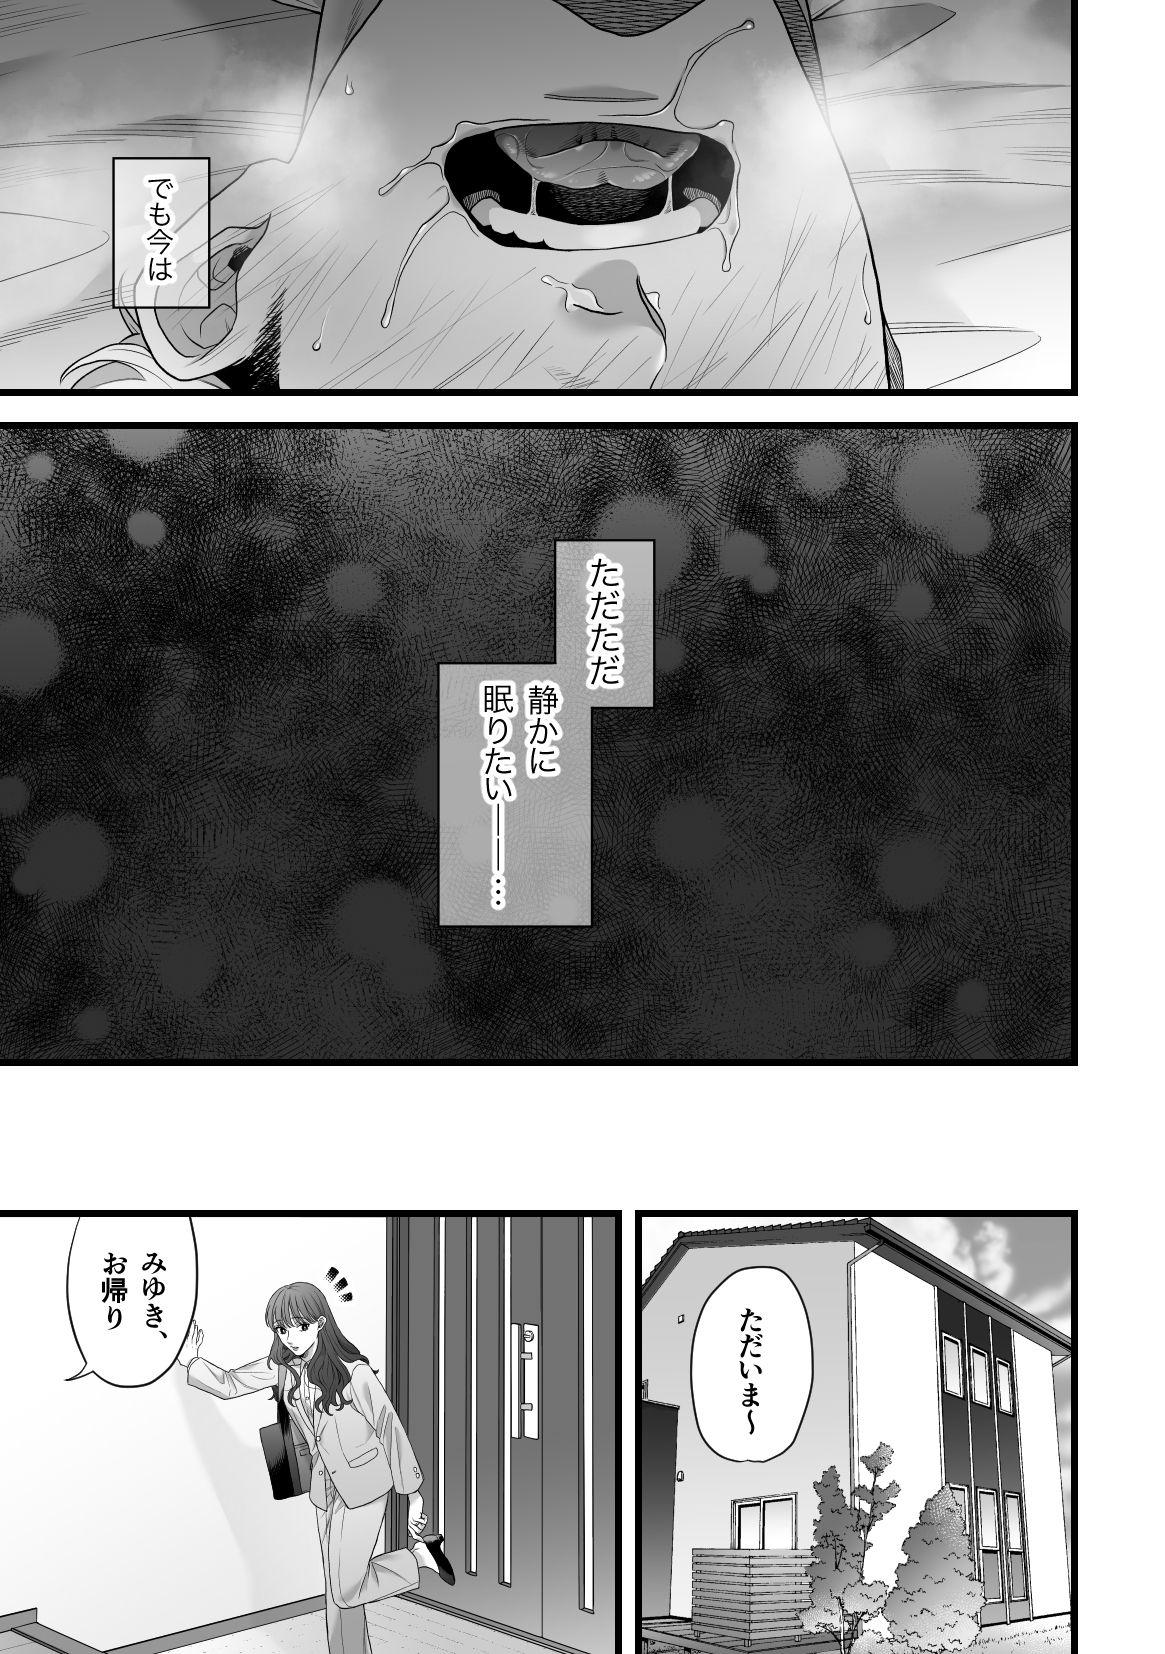 Gikei Ryoujoku 22